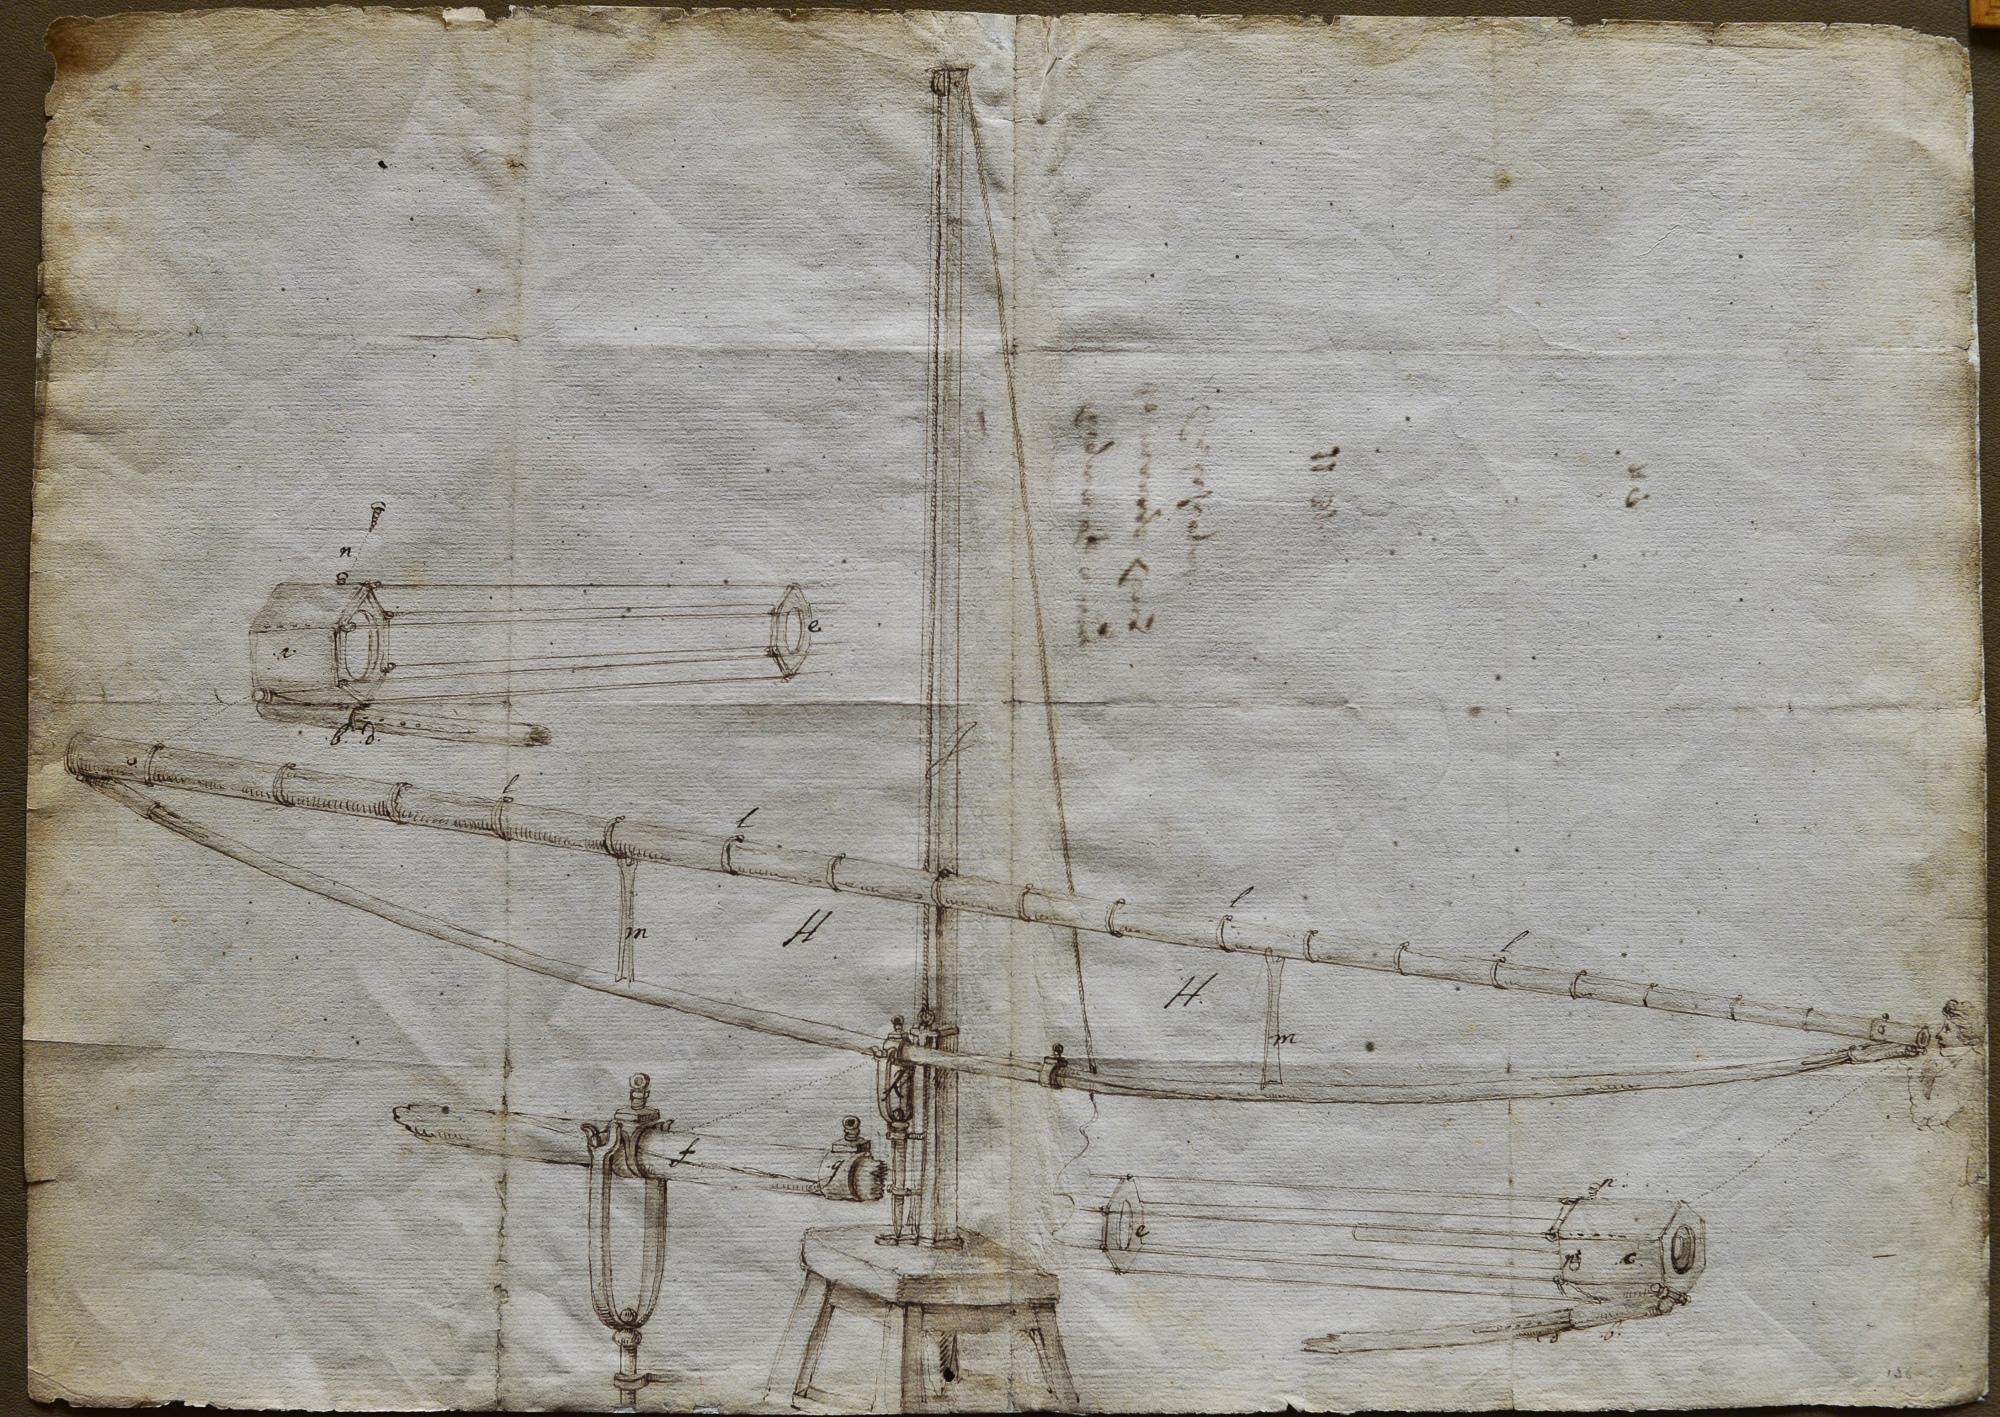 Principia et télescope Newton 2 S.Brunier.jpg